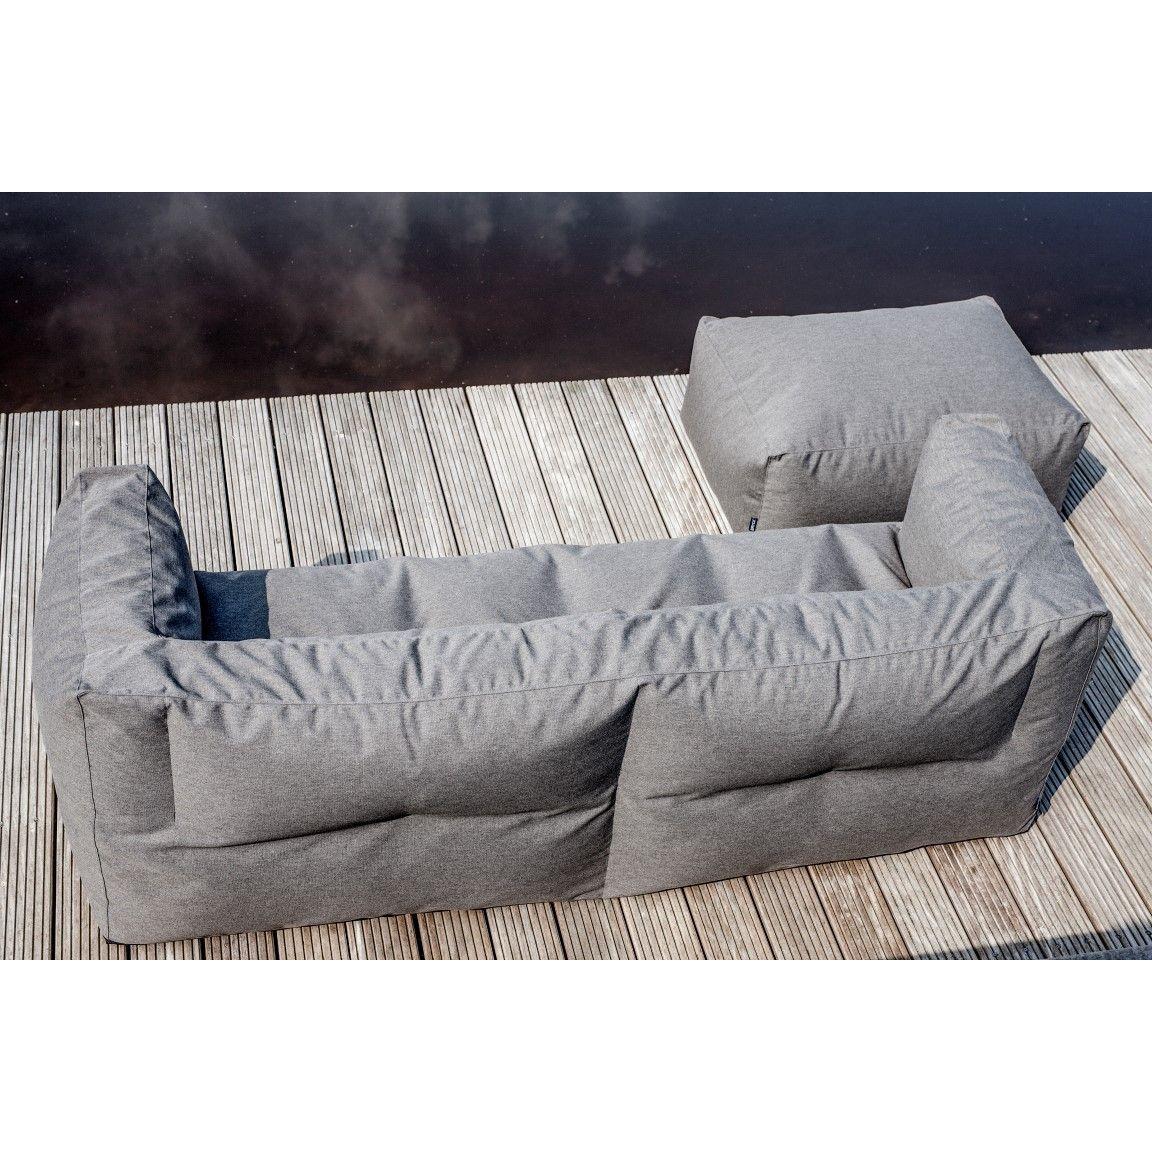 Couch 3-Seat   COPPERish ECO